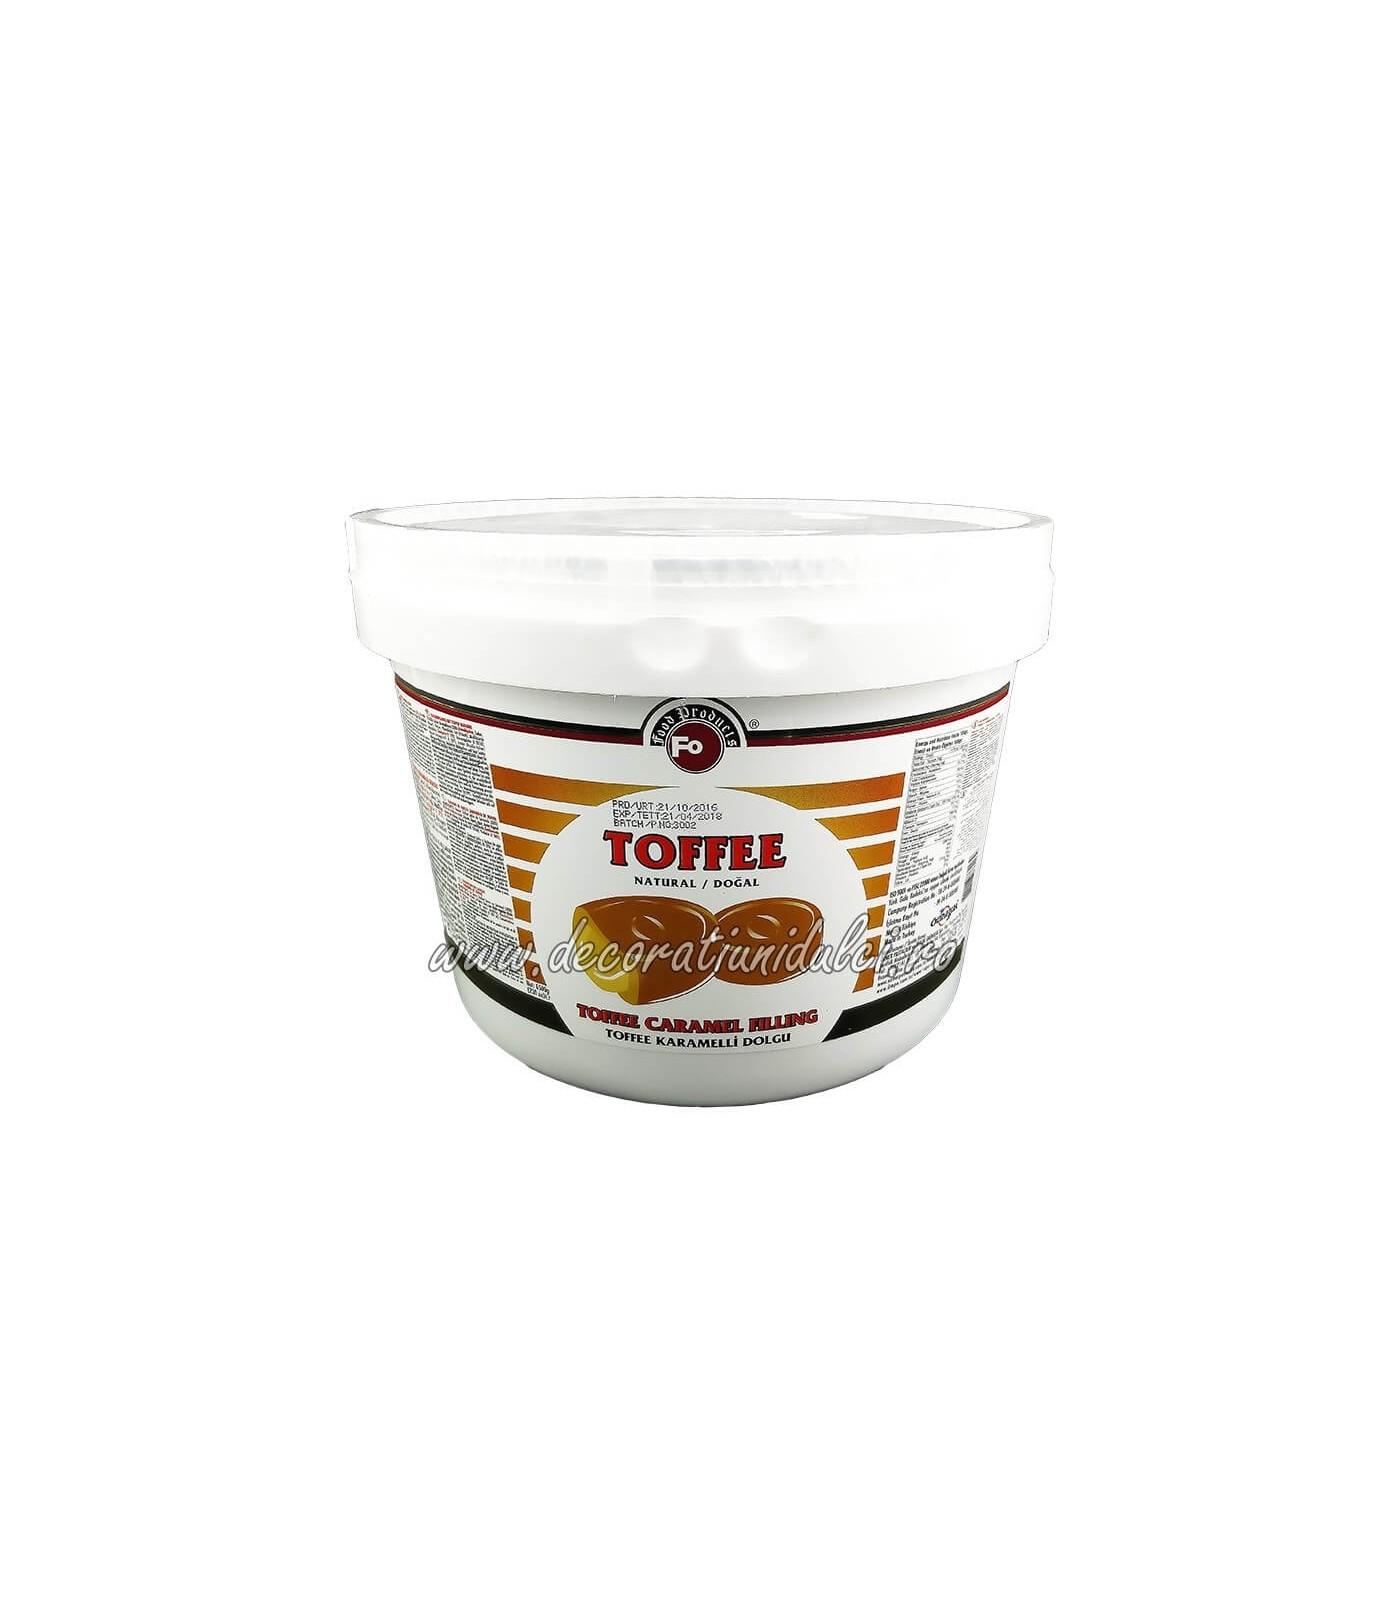 Crema Toffee FoDekor